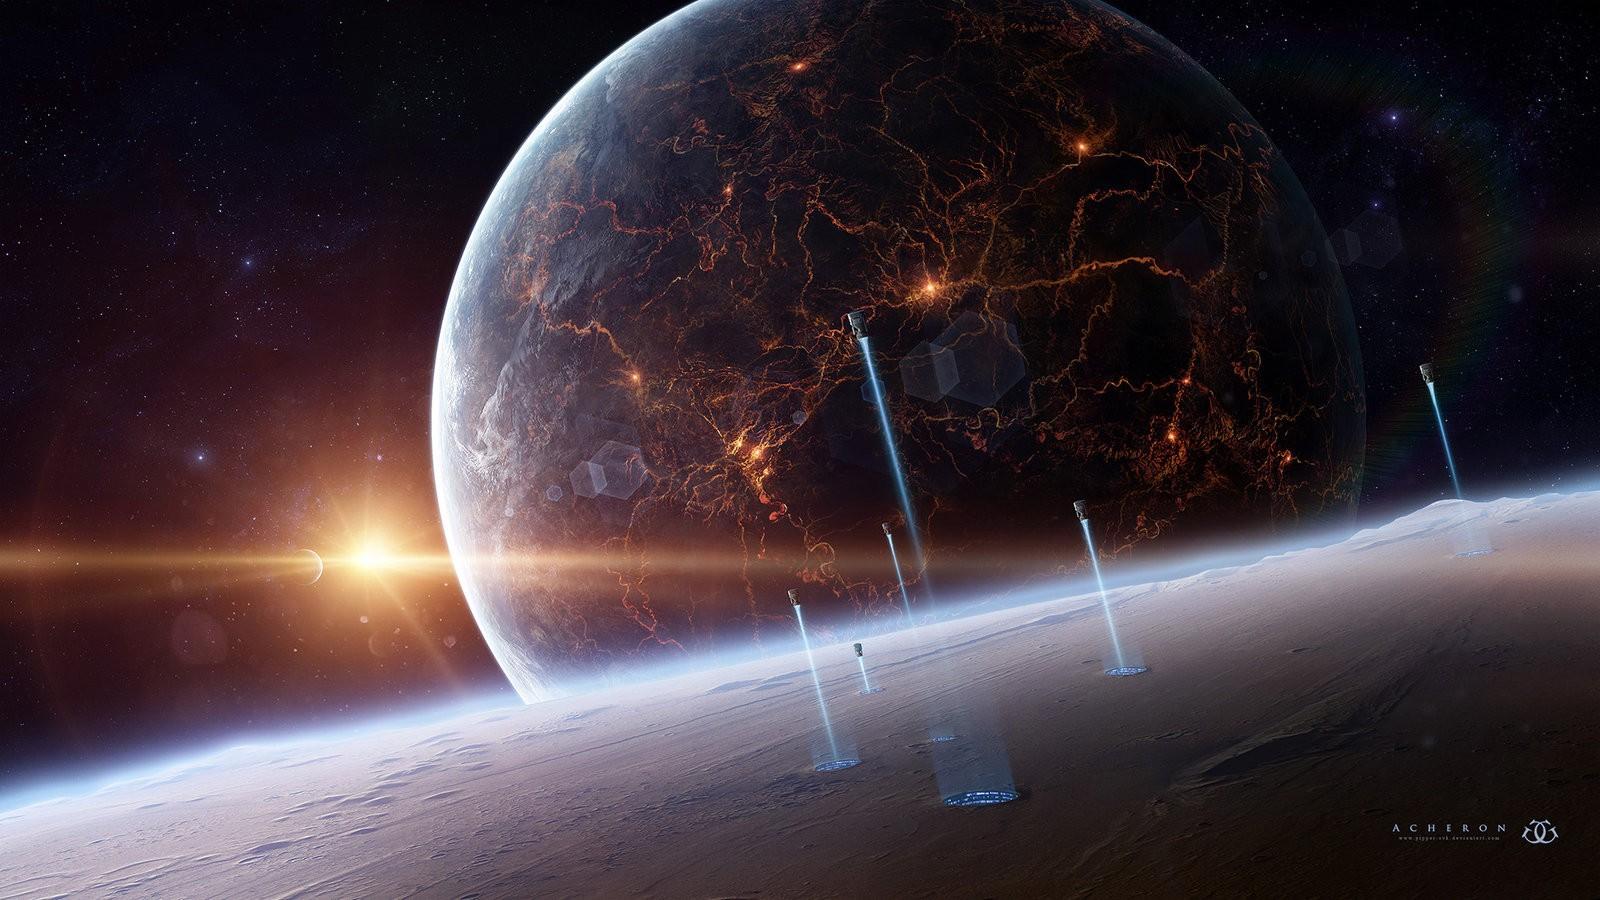 Earth Digital Art Hd Wallpaper: Wallpaper : Digital Art, Night, Planet, Earth, Space Art